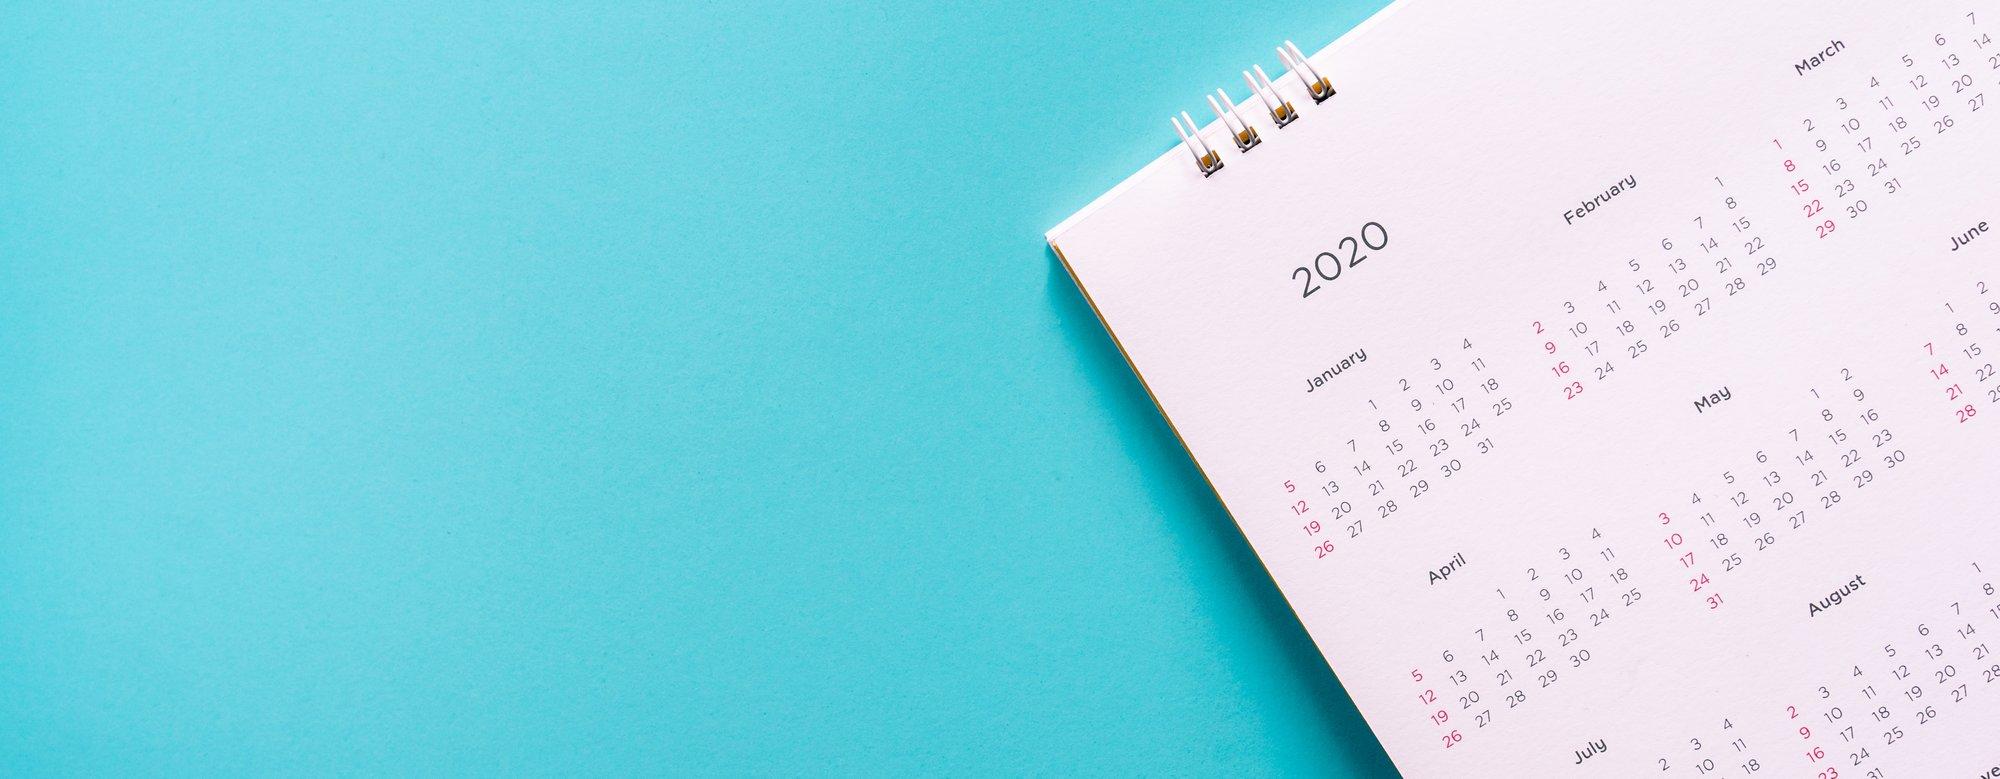 Расписание онлайн мероприятий